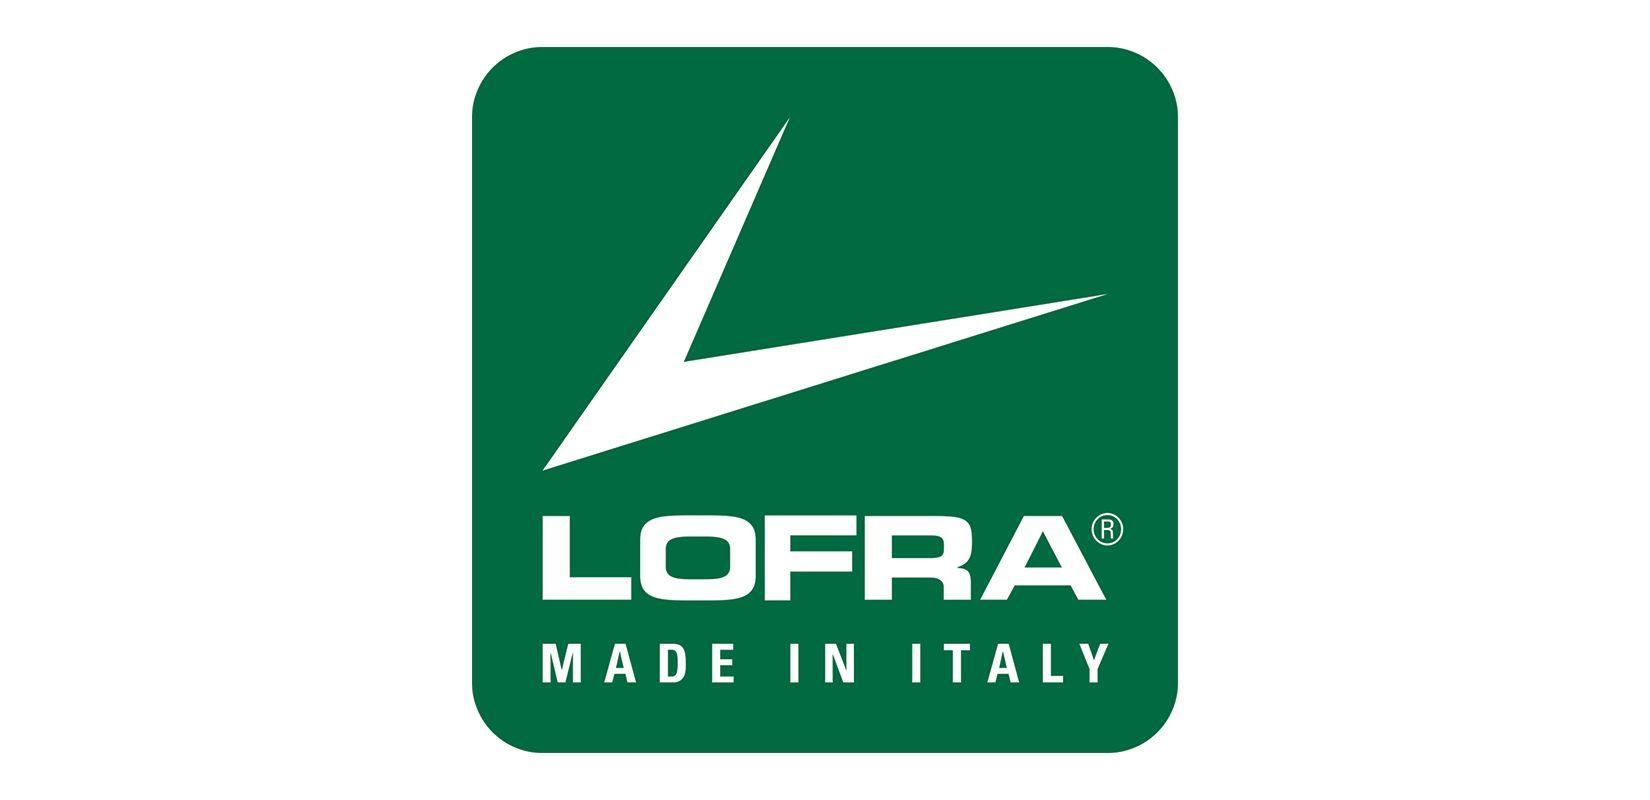 Lofra Repairs Washing Machine Dishwasher Oven Cooker